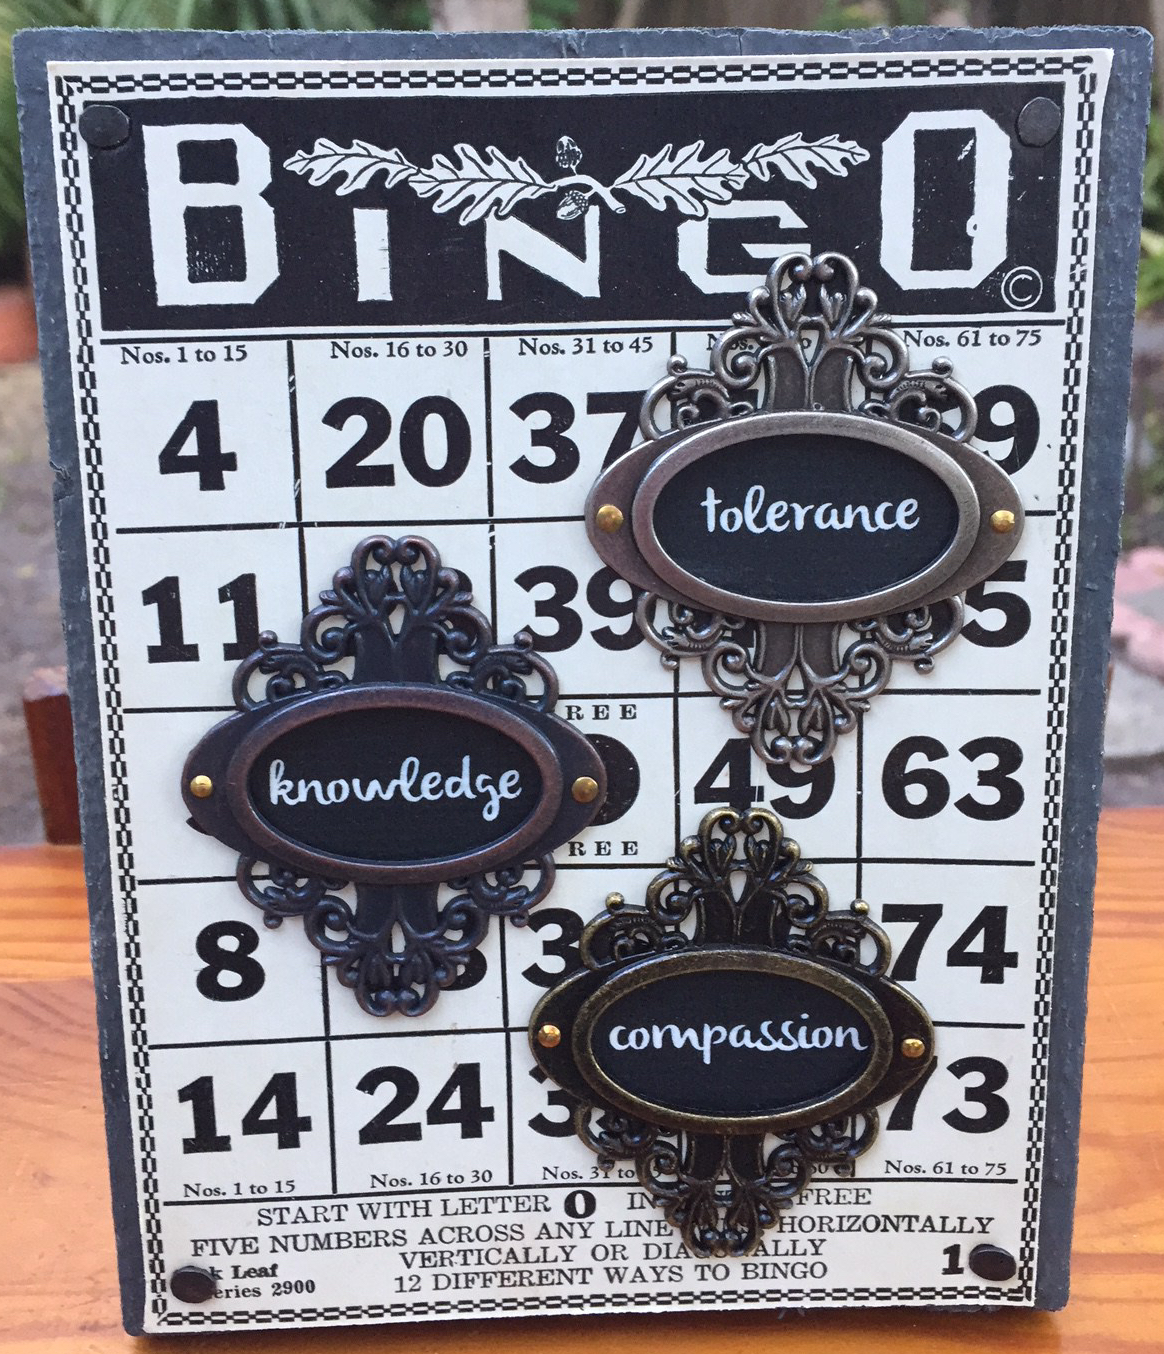 Karmic Bingo No. 6